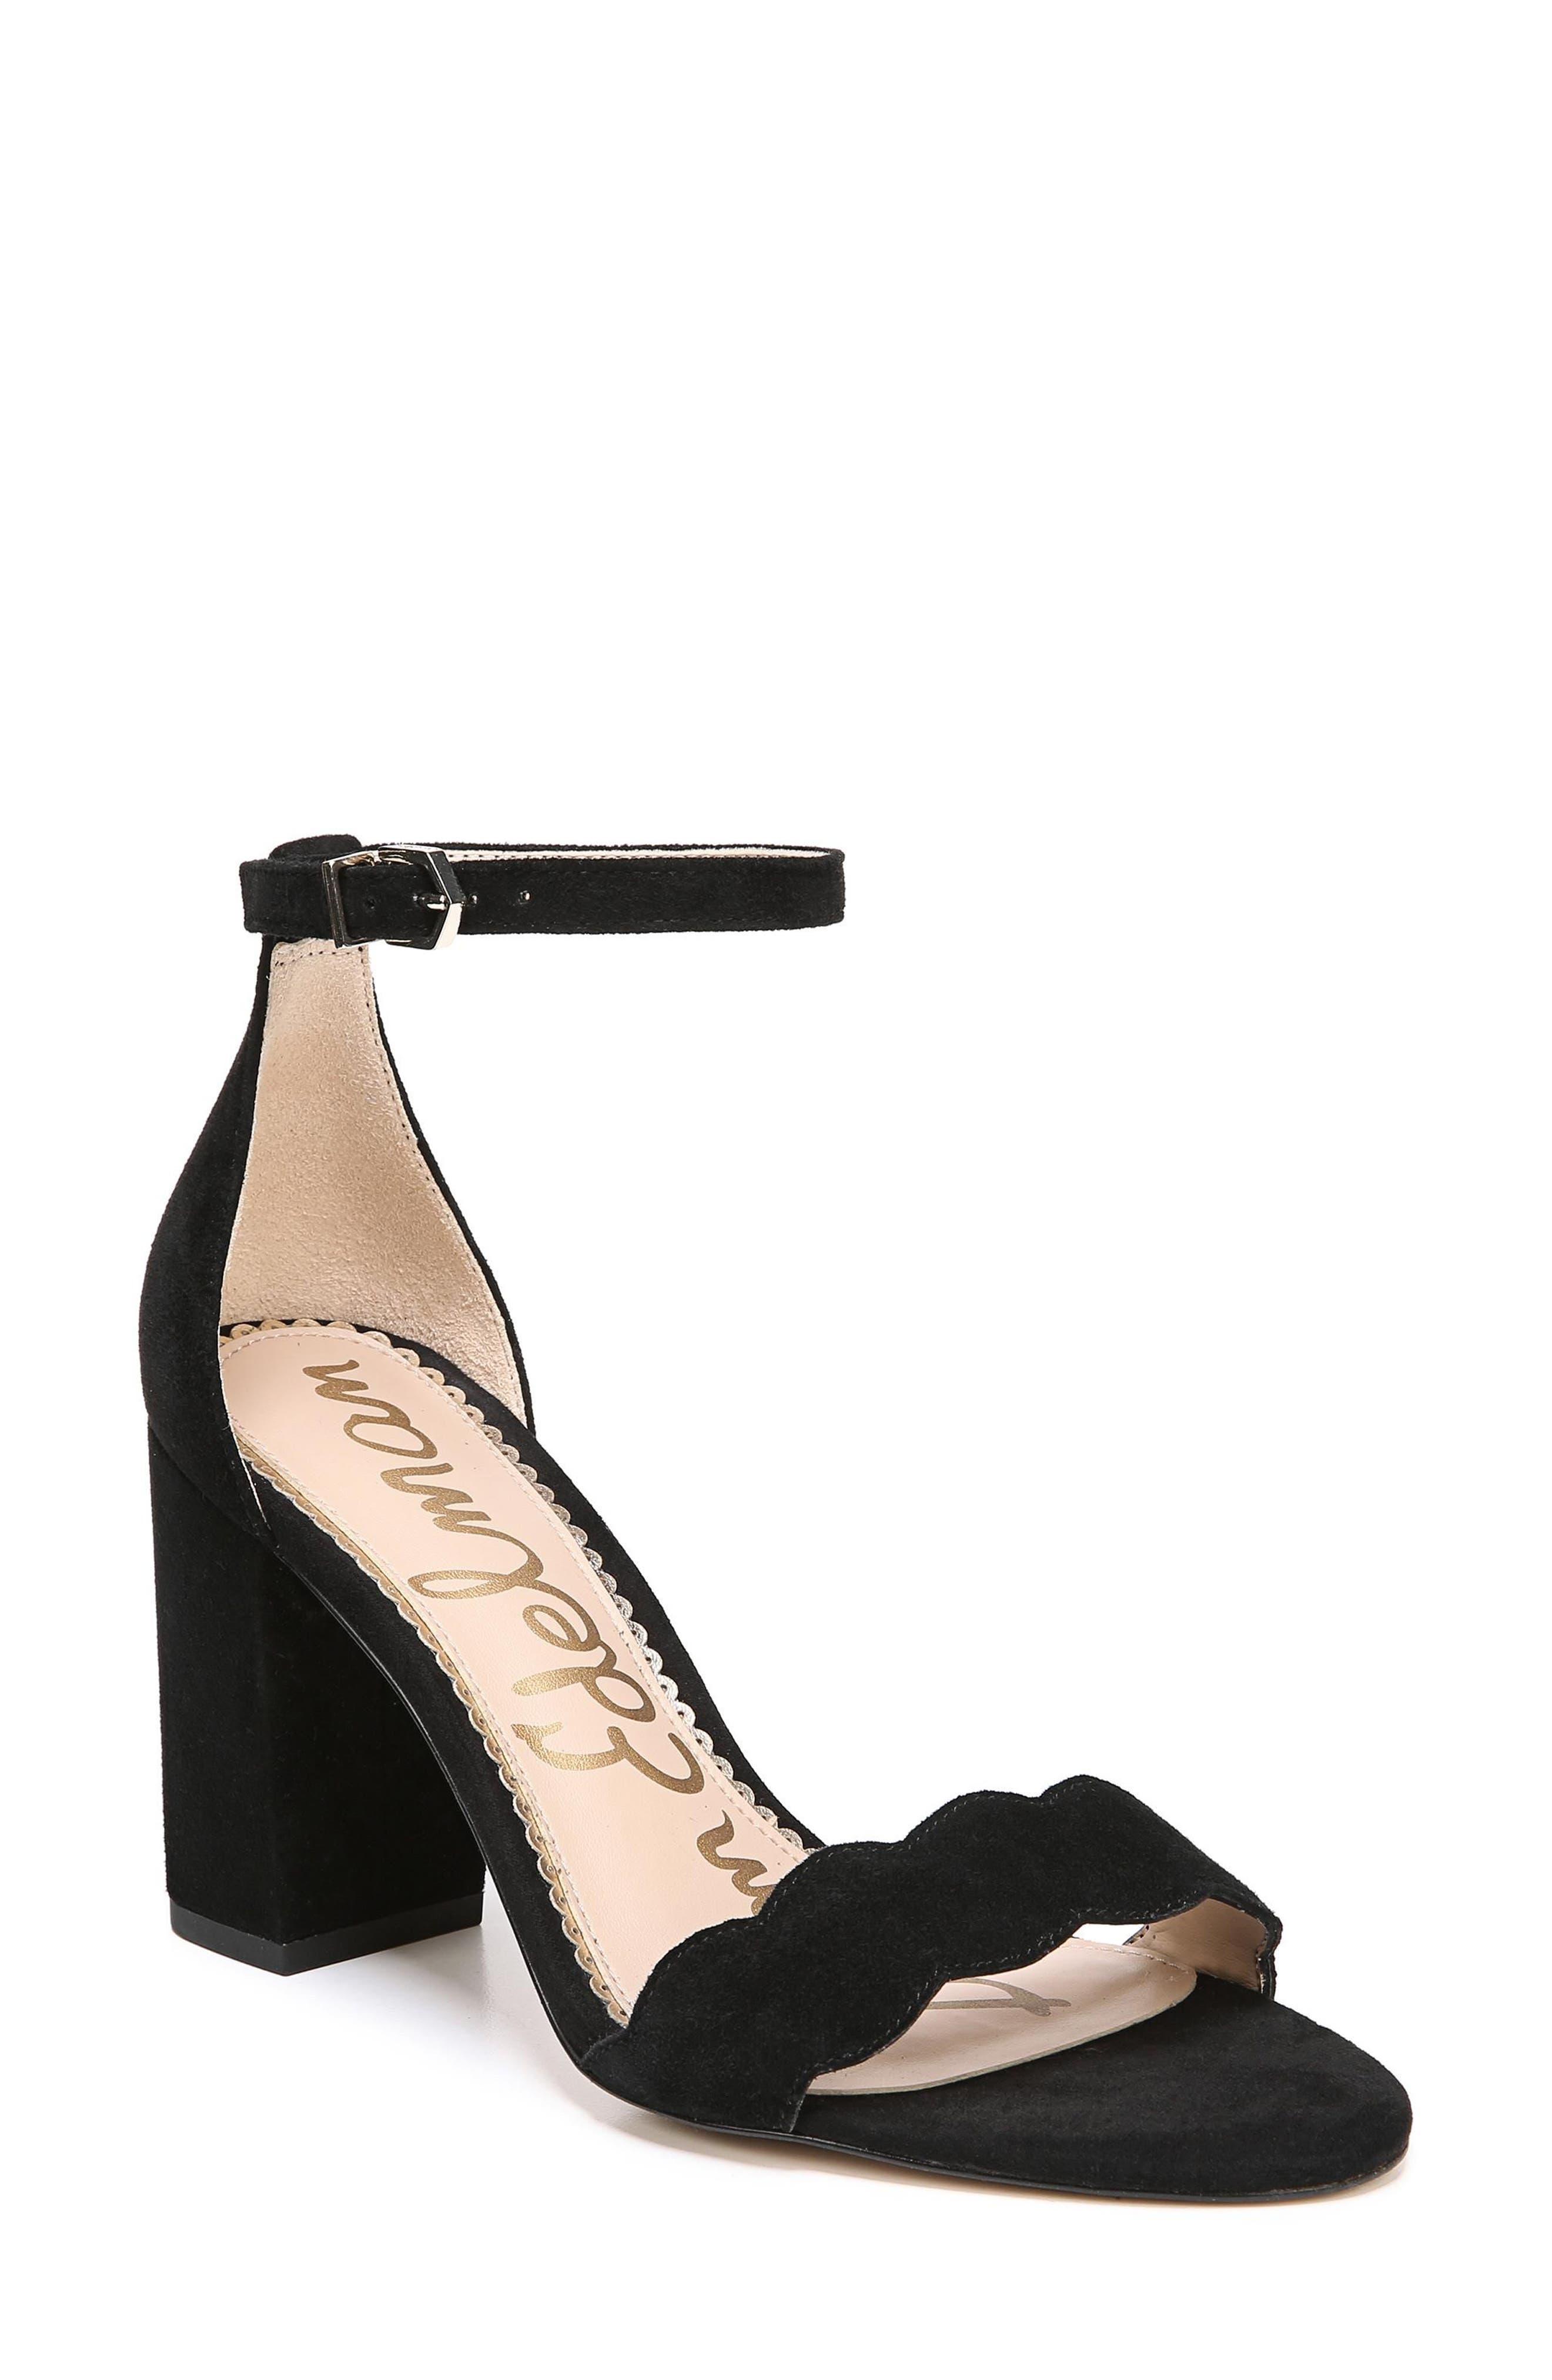 Odila Sandal,                         Main,                         color, Black Suede